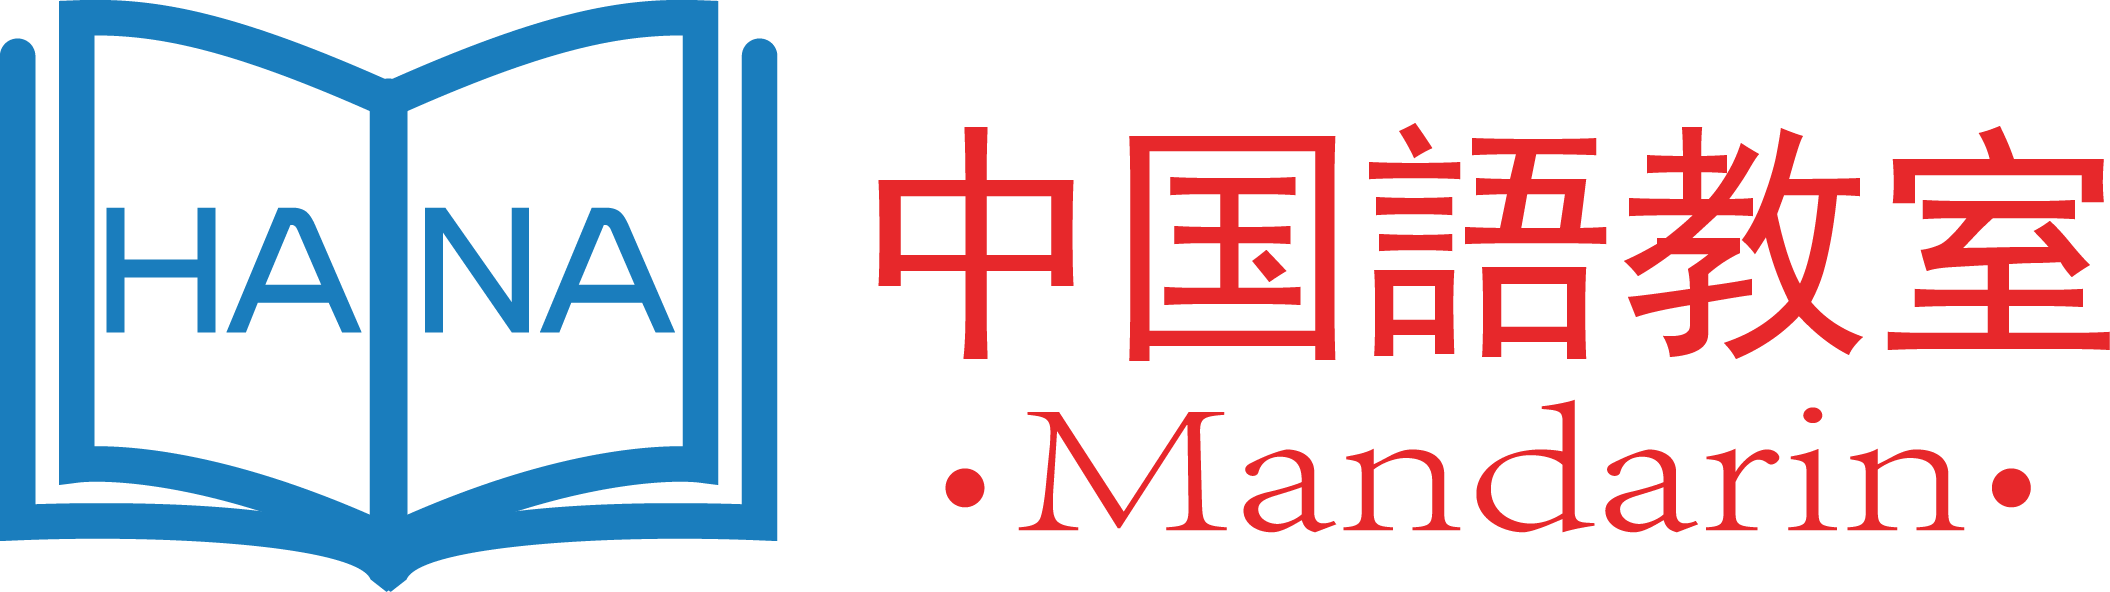 HANA 02